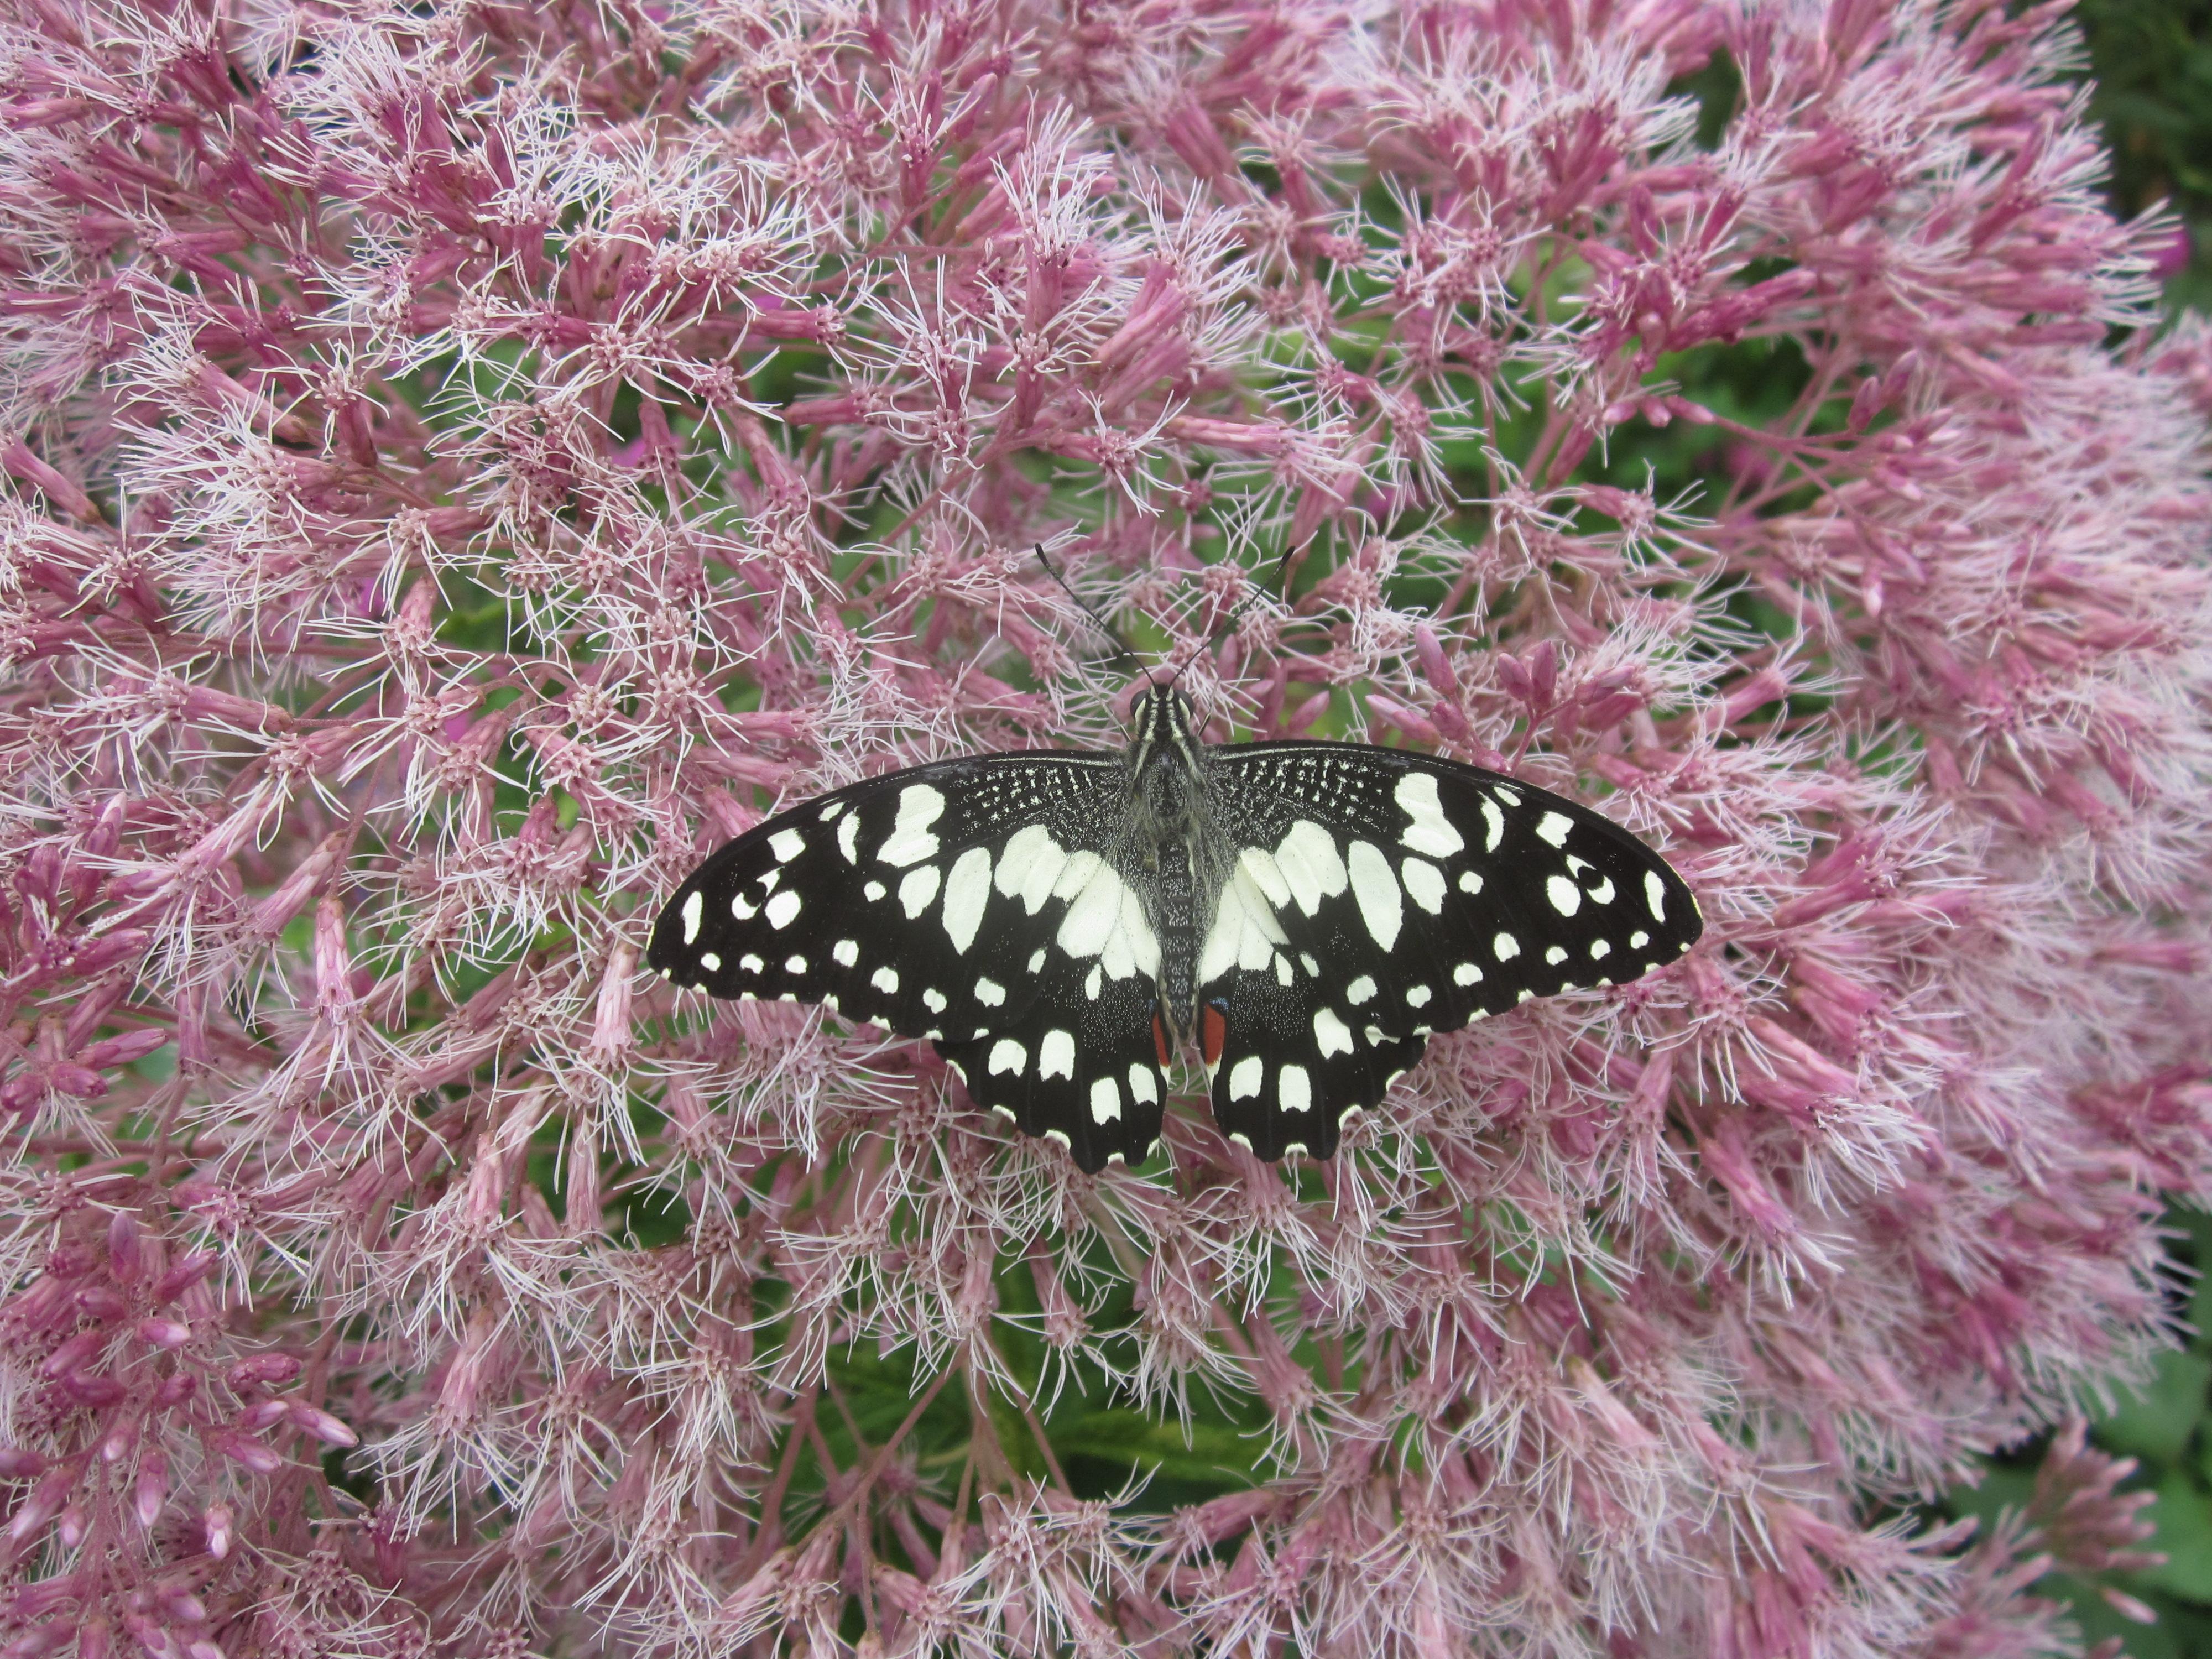 073_2014 Ray Bribie Garden Club pics 058